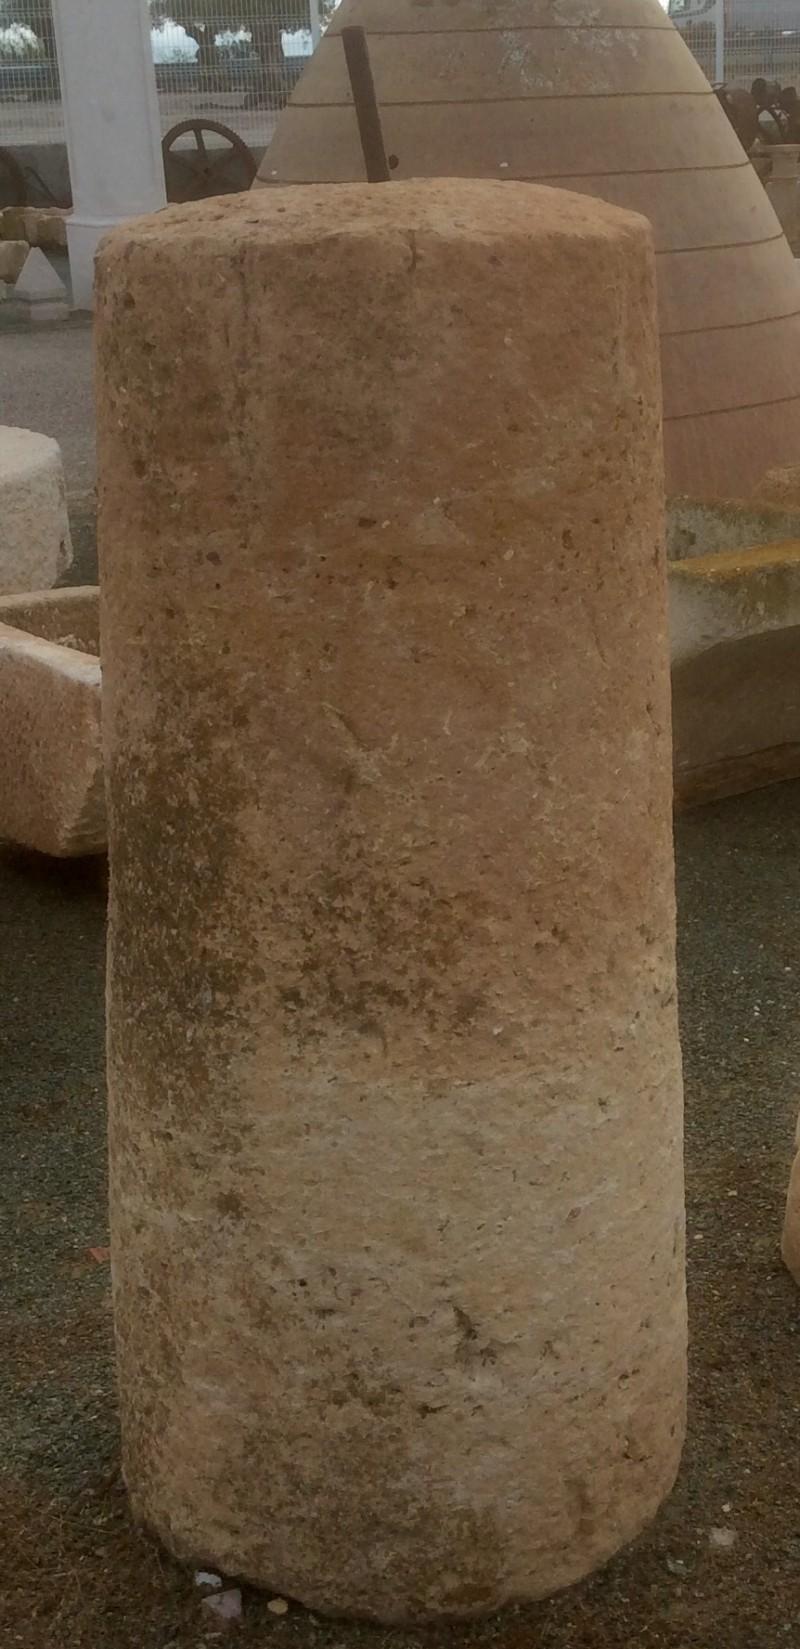 Rulo de piedra caliza. Mide 55 cm de diámetro x 1.20 cm de alto.